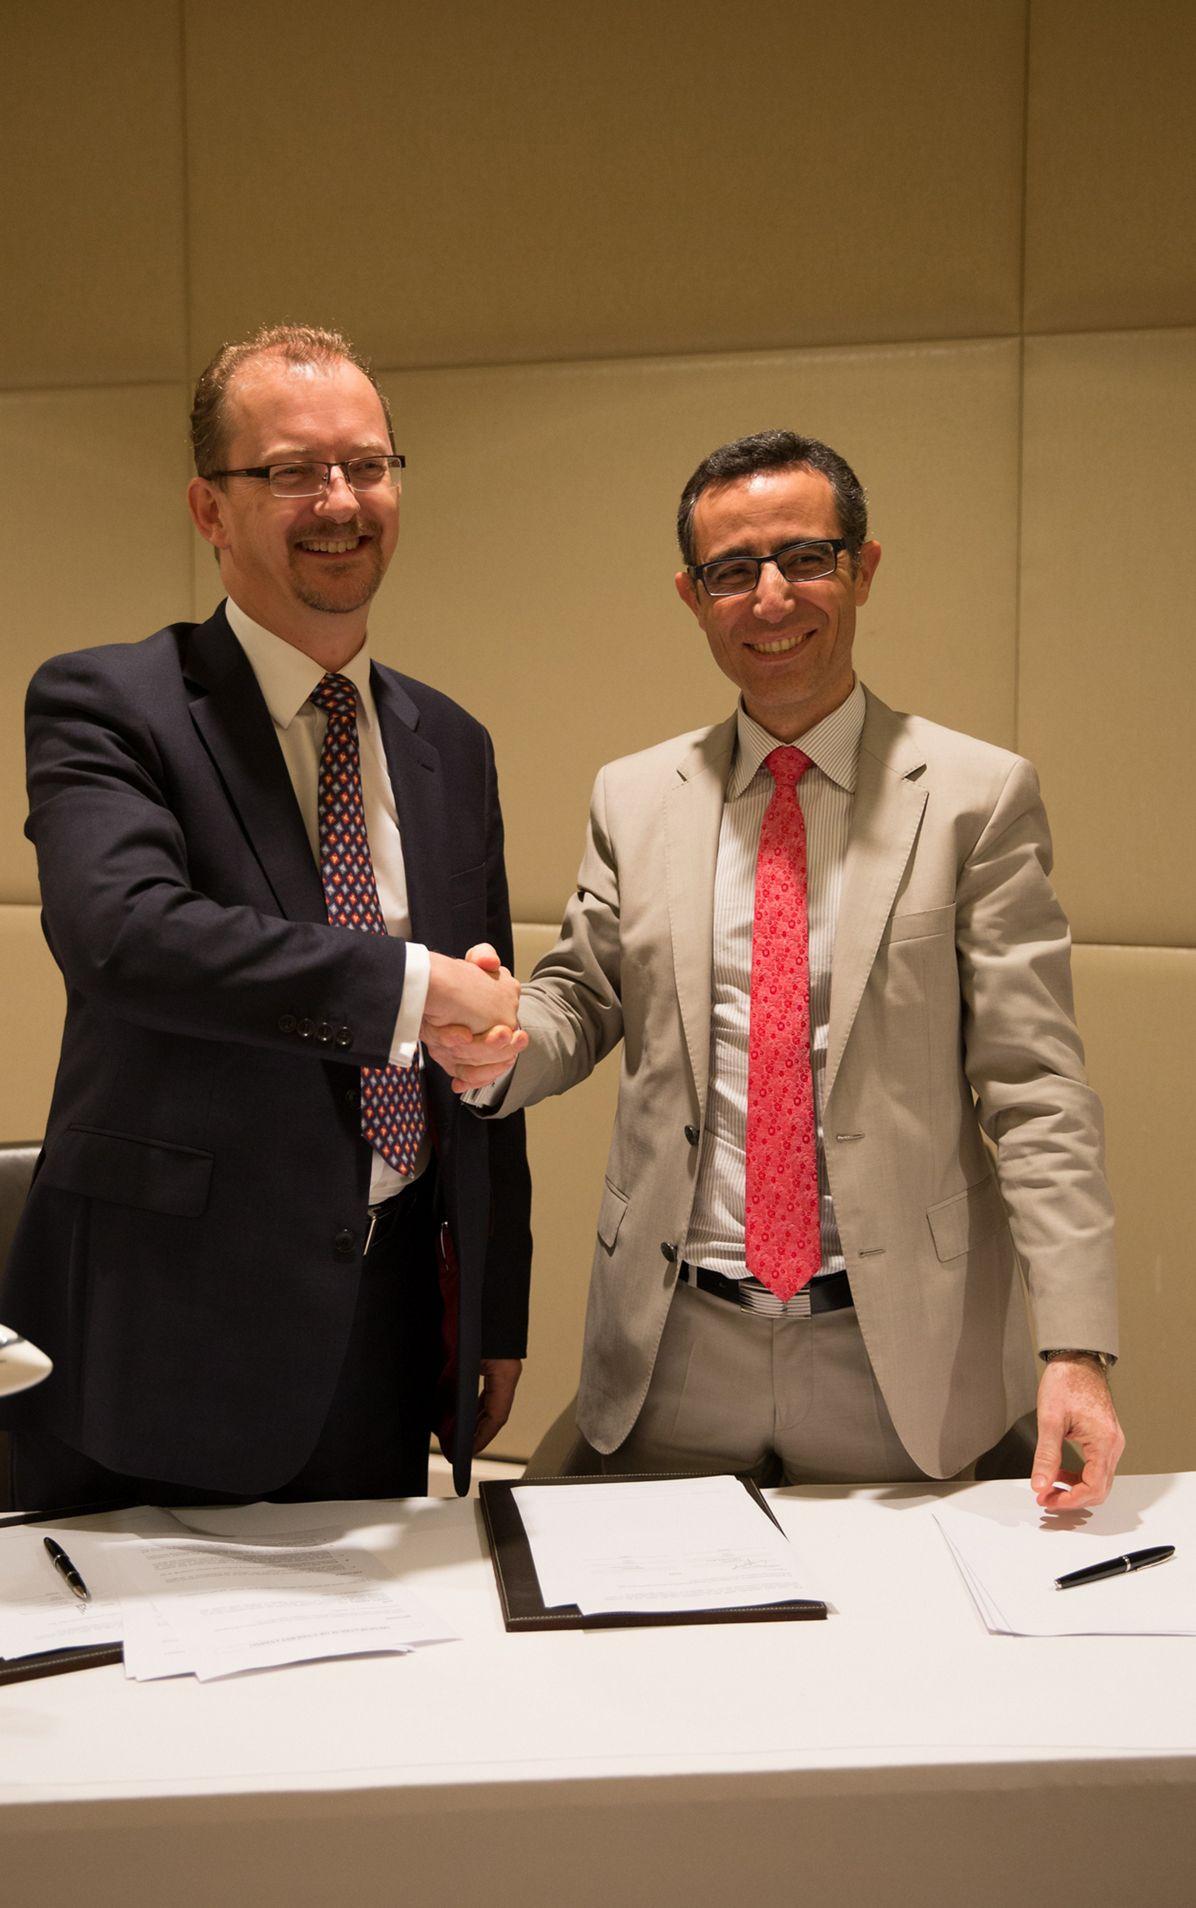 UNESCO backs Airbus initiative to engineer tomorrow's world